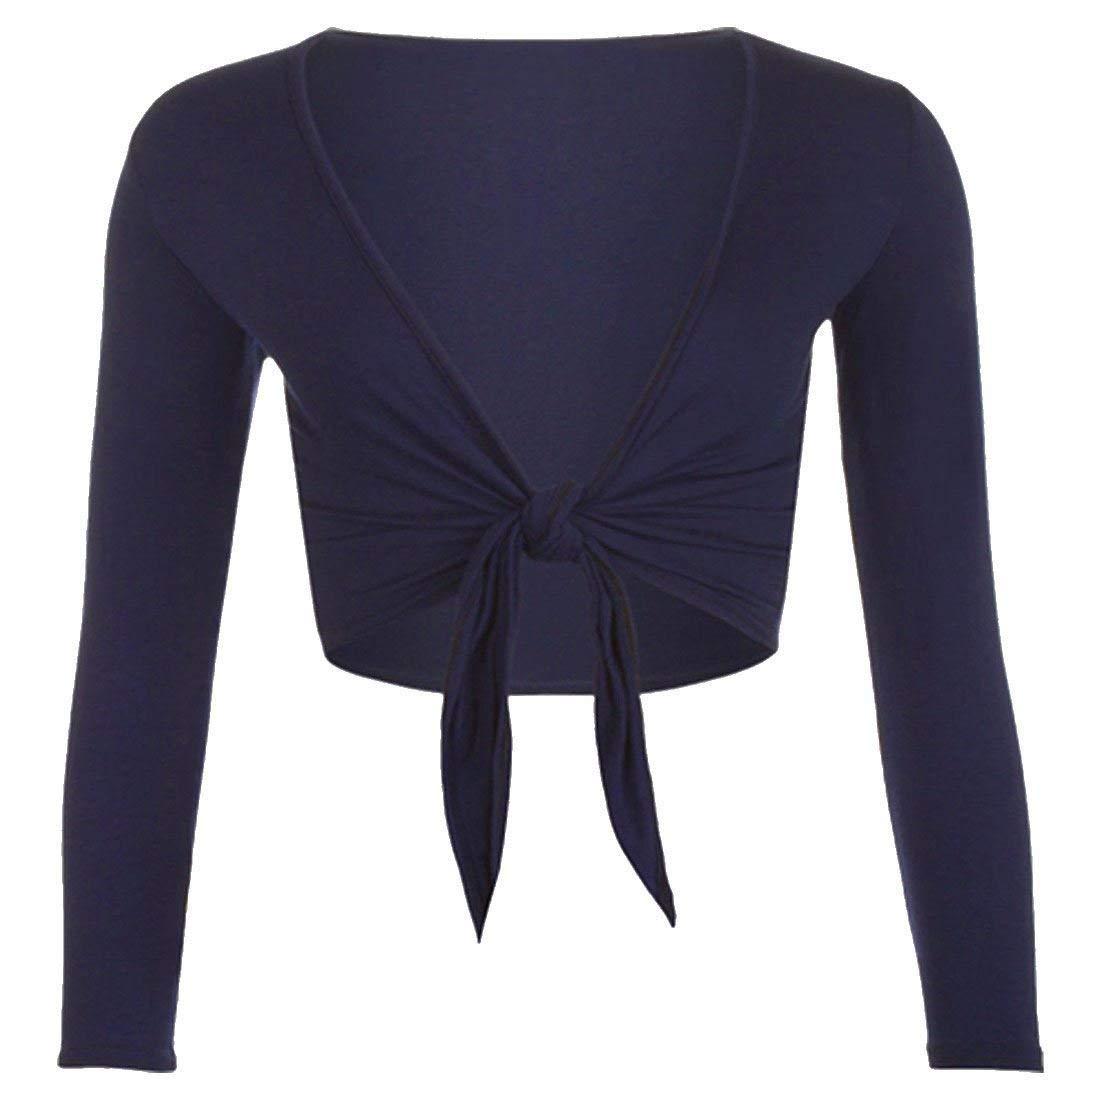 REAL LIFE FASHION LTD Womens Cropped Tie up Front Bolero Cardigan Ladies Long Sleeve Plain Top Shrug